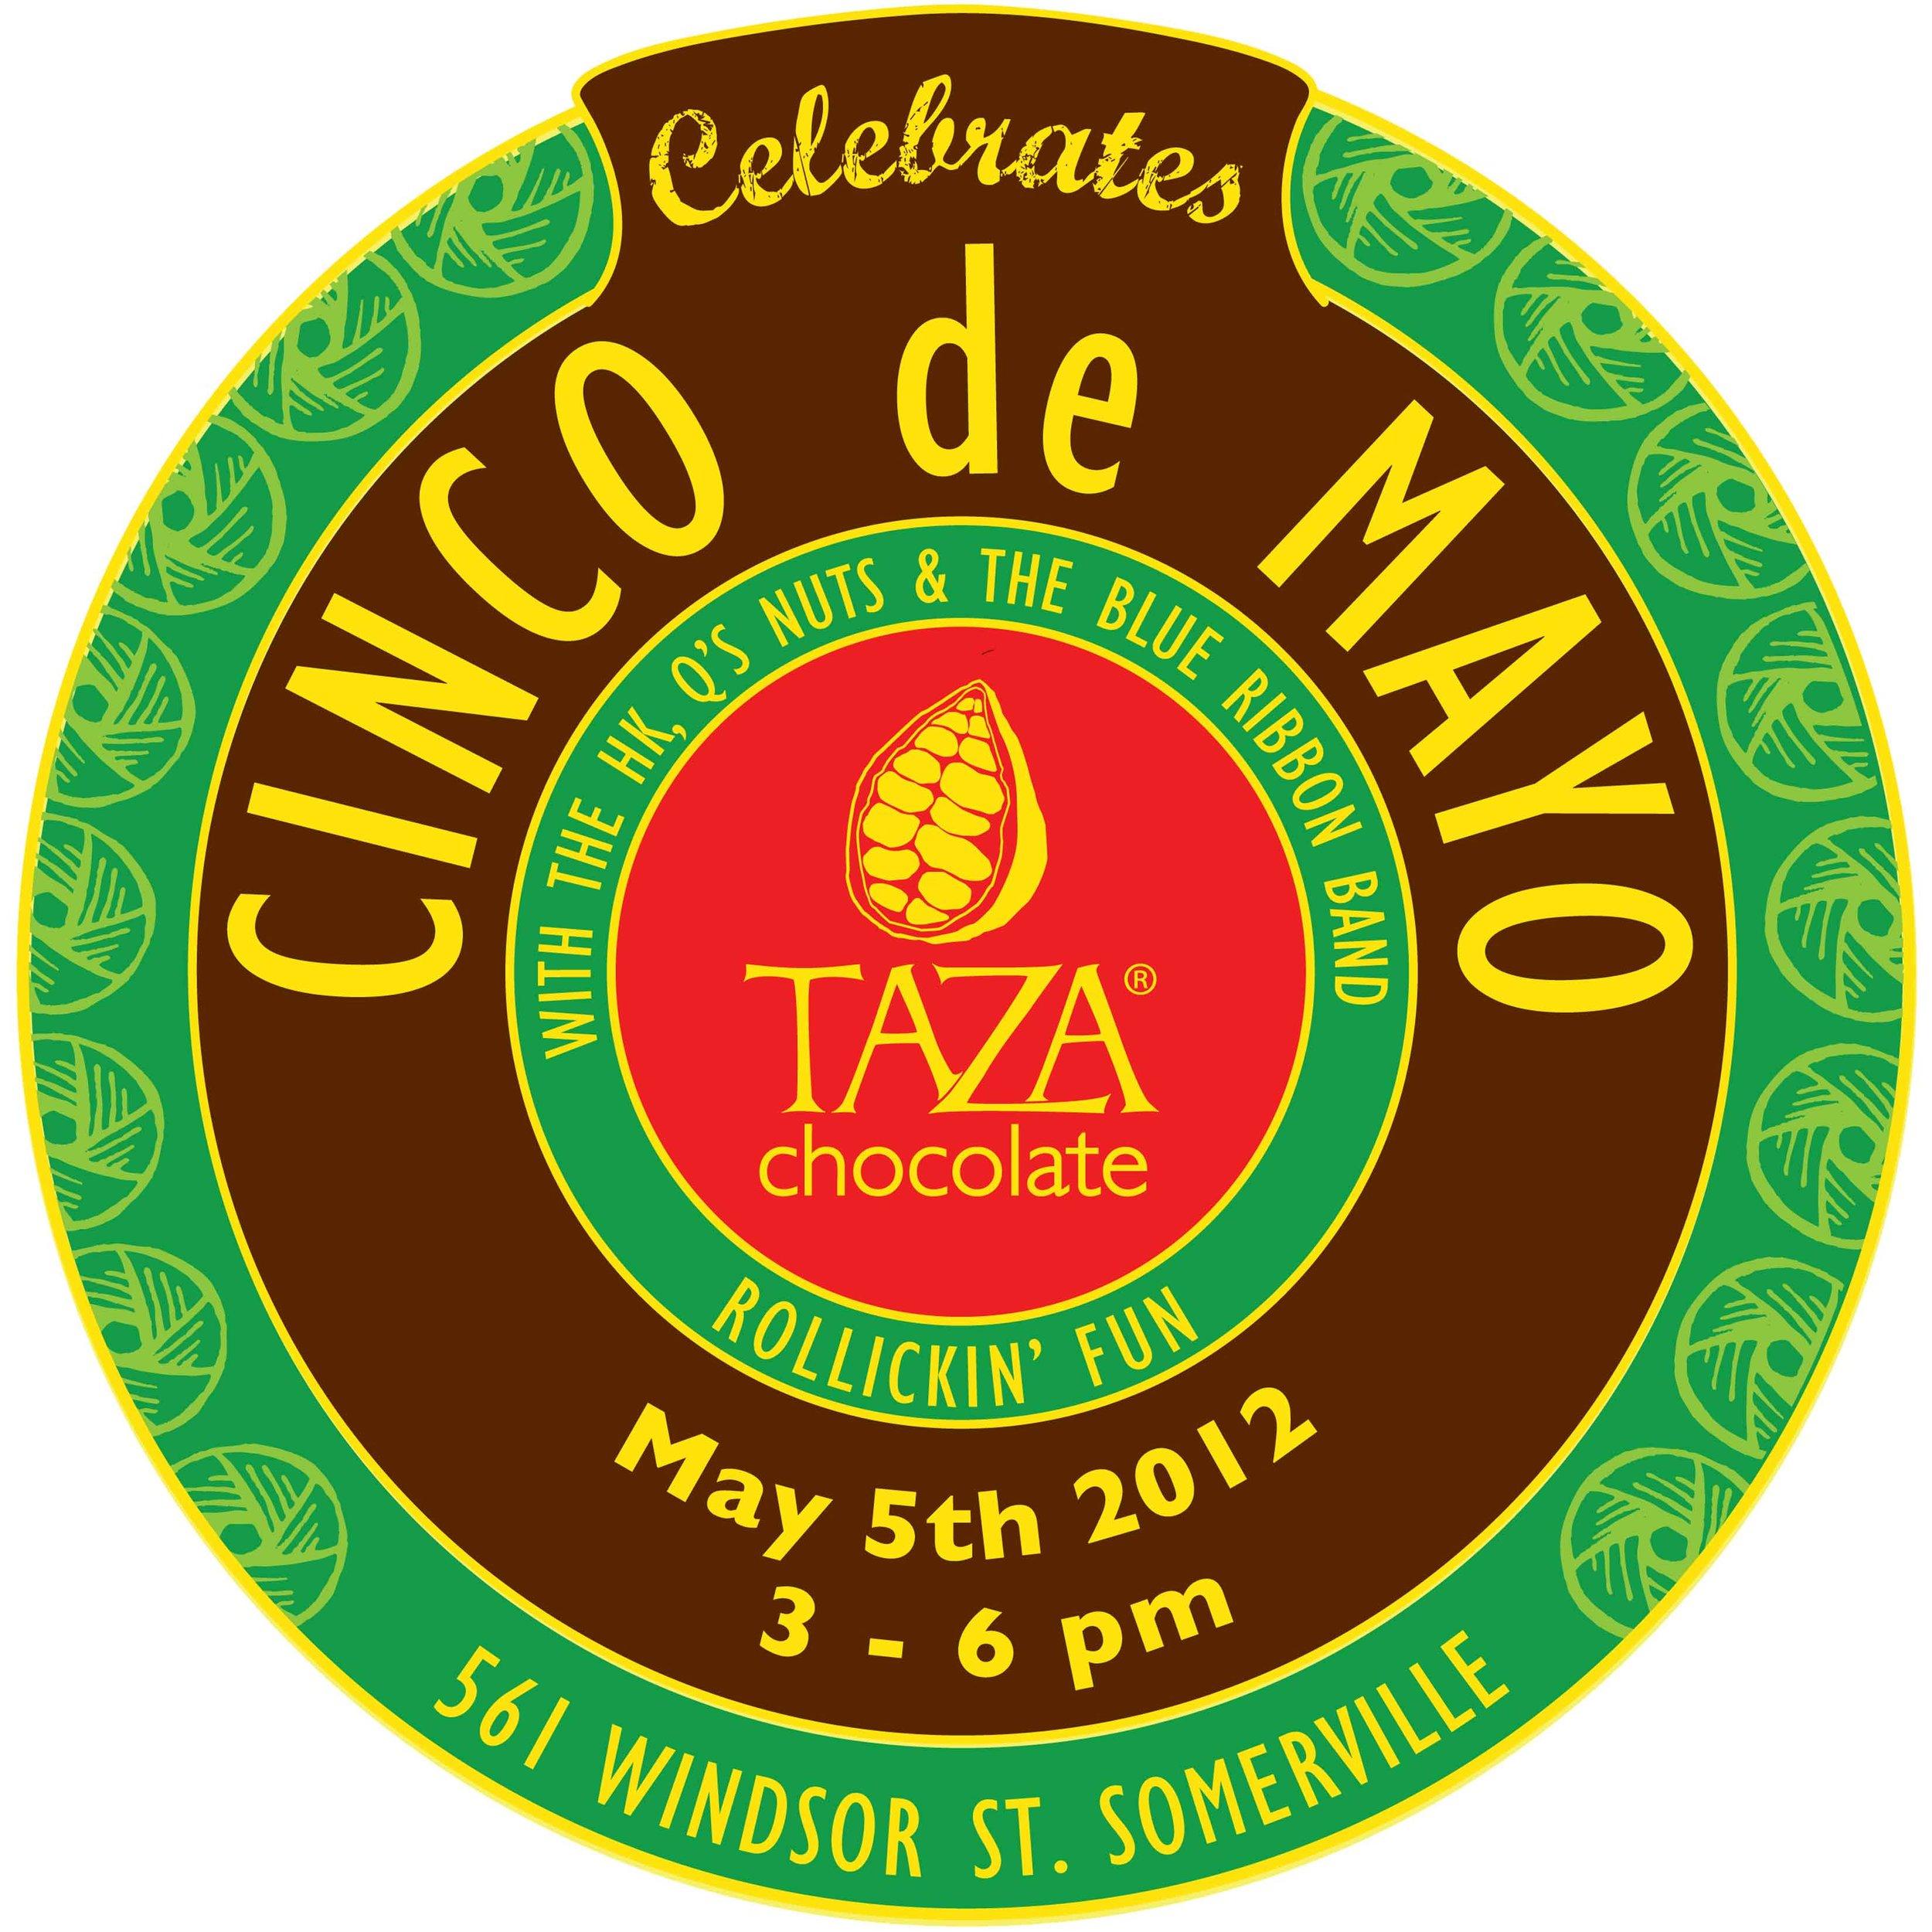 TazaCinco-De-Mayo-1